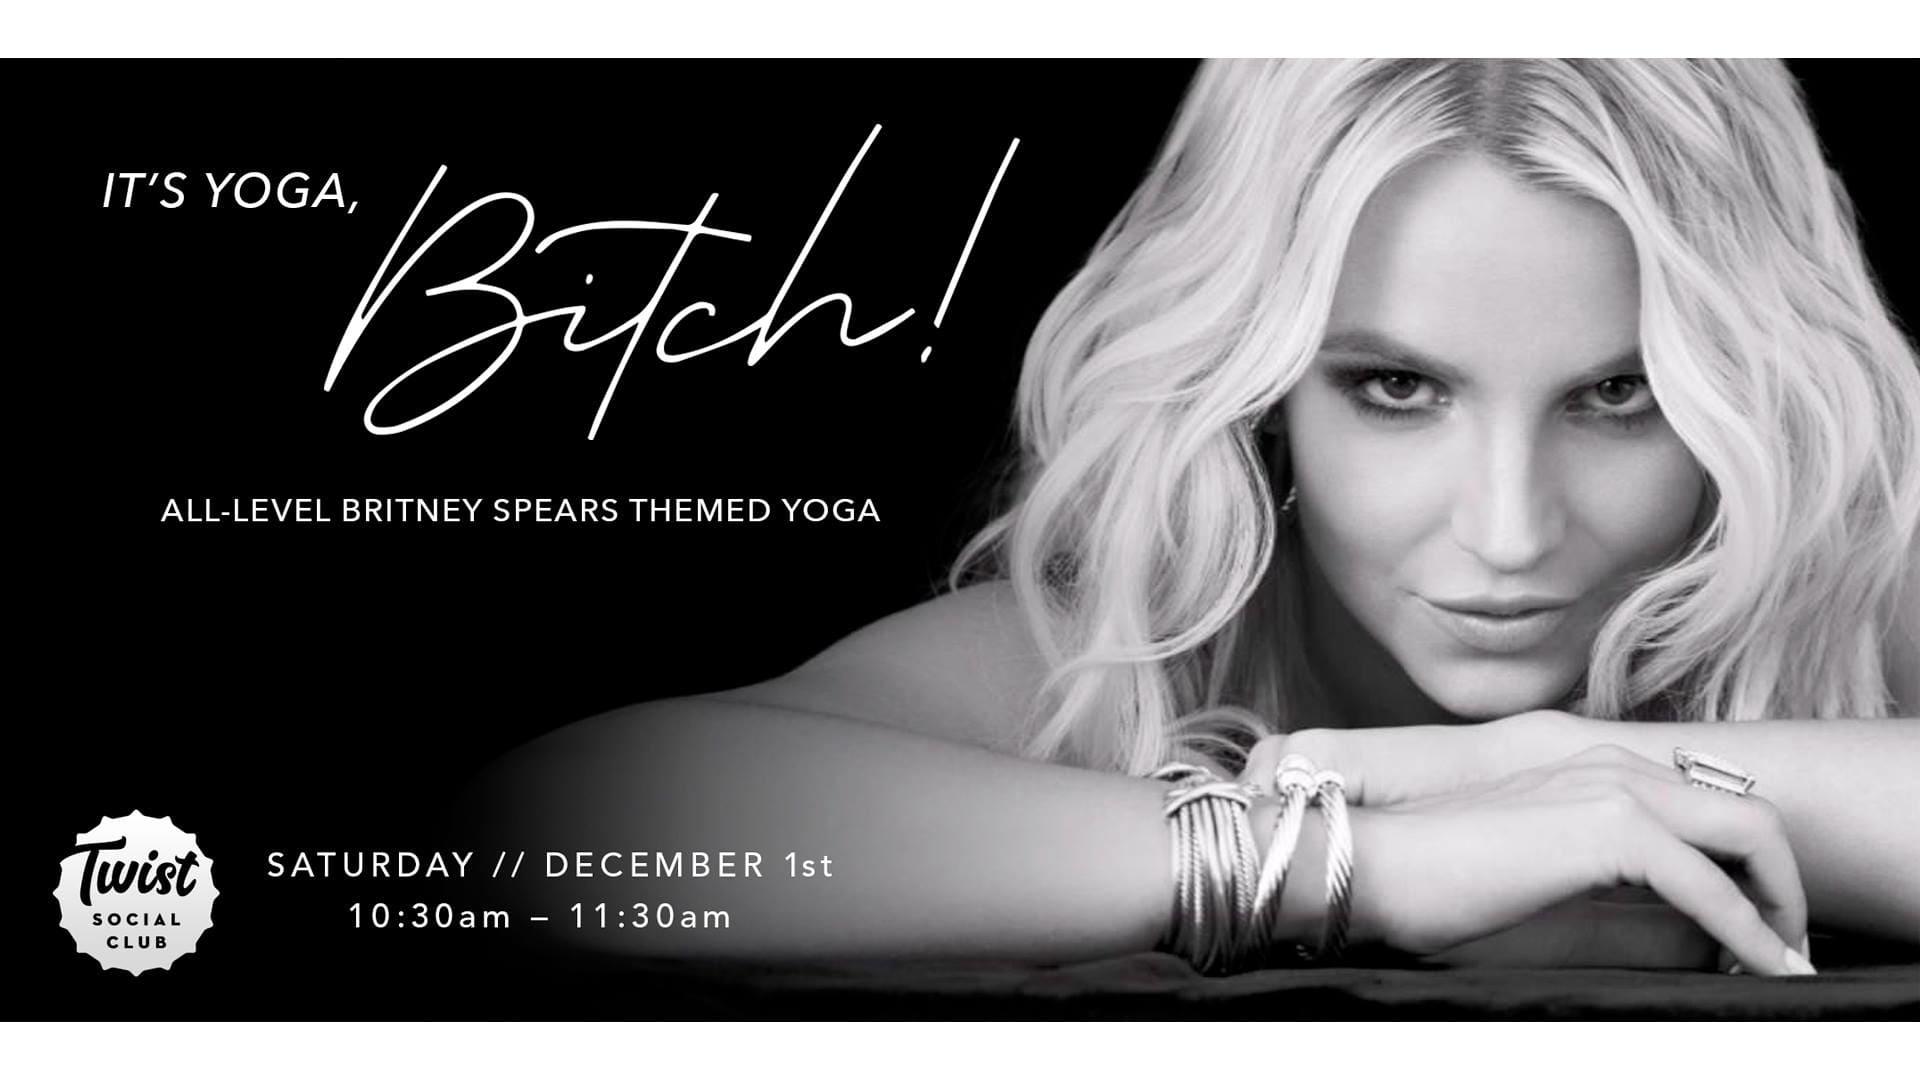 It's Yoga, Bitch!